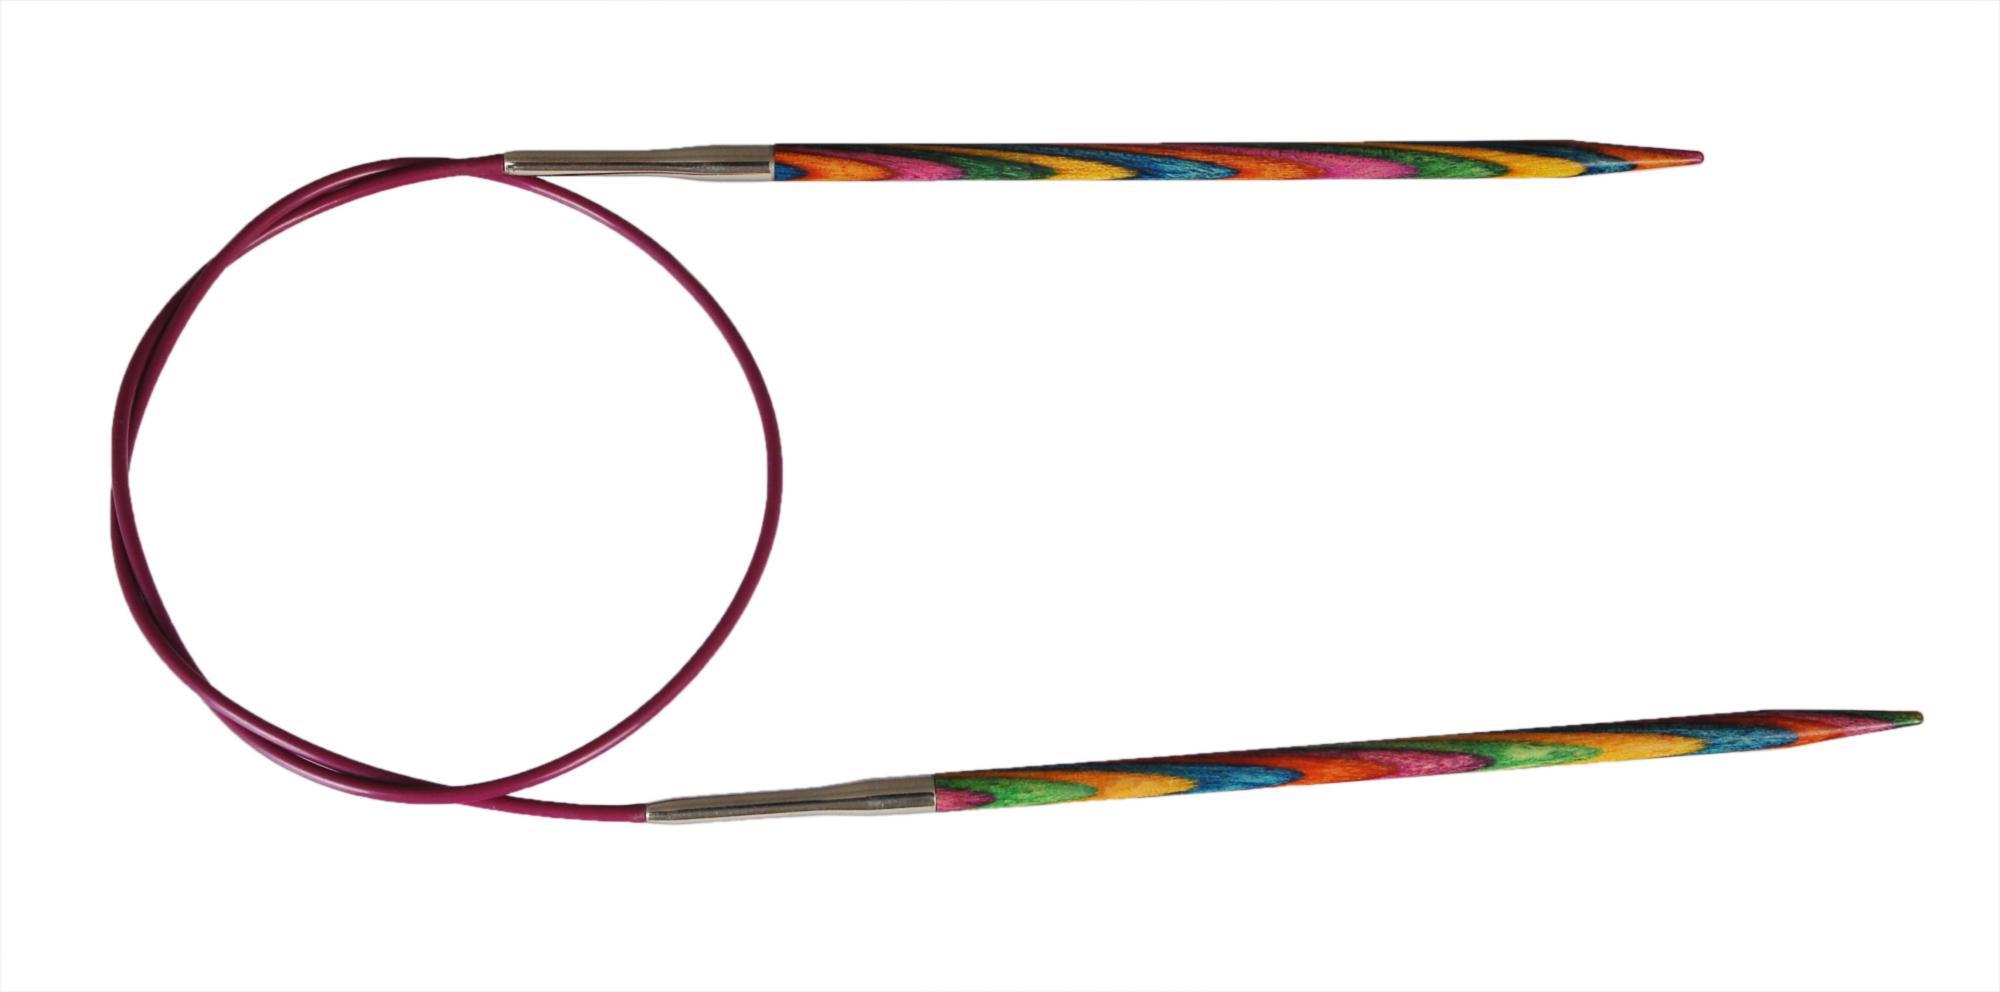 Спицы круговые 150 см Symfonie Wood KnitPro, 20511, 2.00 мм